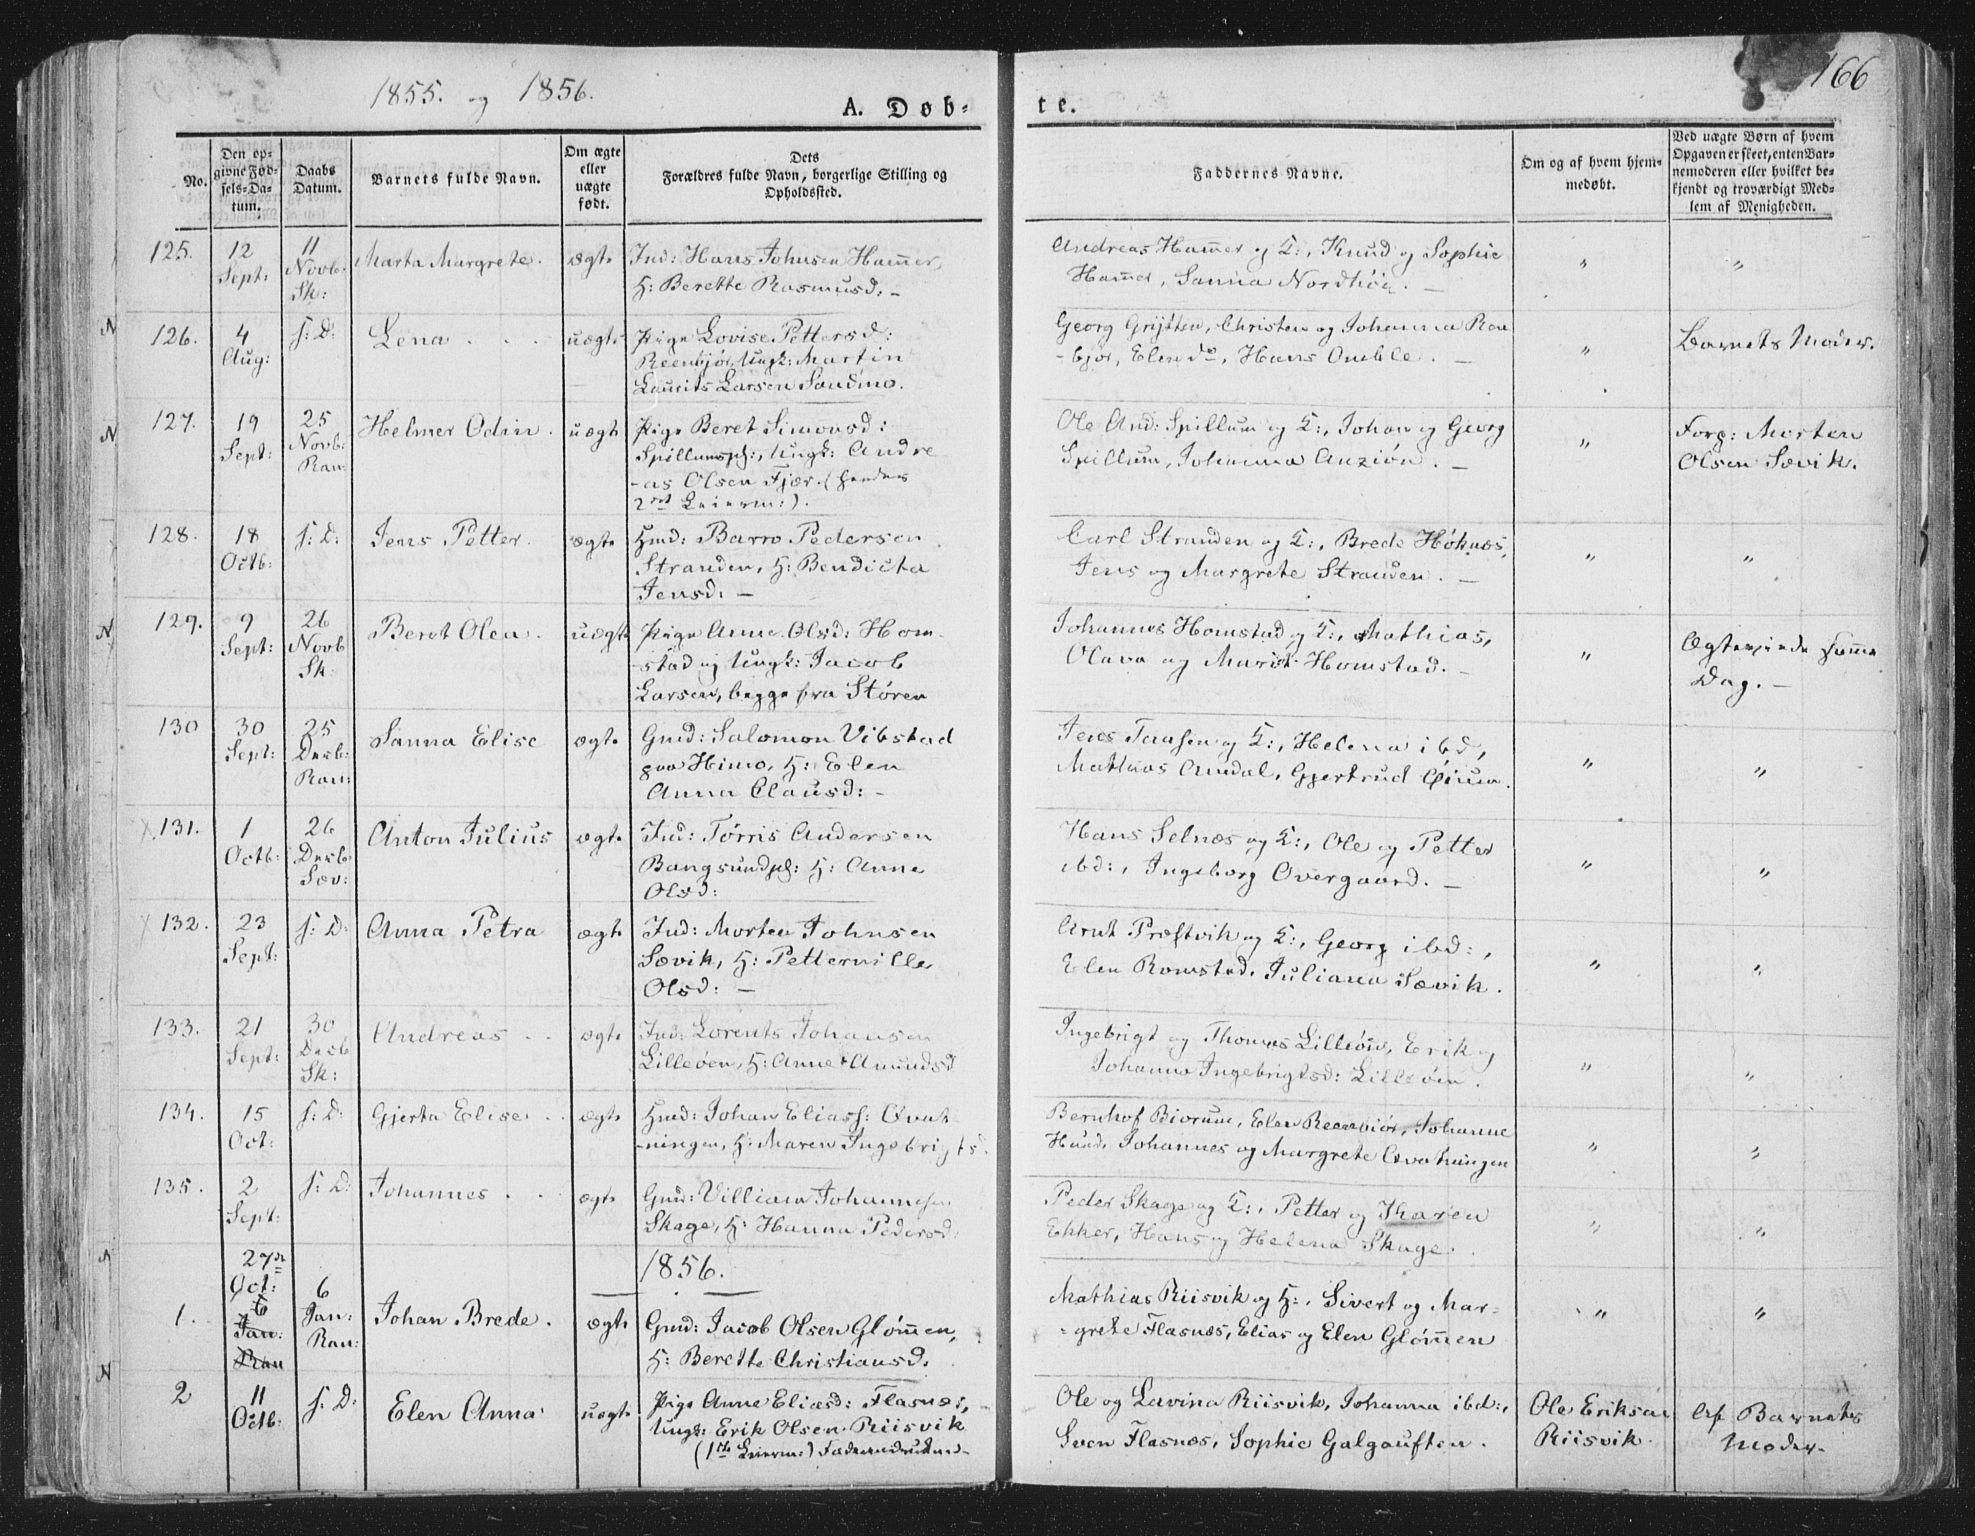 SAT, Ministerialprotokoller, klokkerbøker og fødselsregistre - Nord-Trøndelag, 764/L0551: Ministerialbok nr. 764A07a, 1824-1864, s. 166